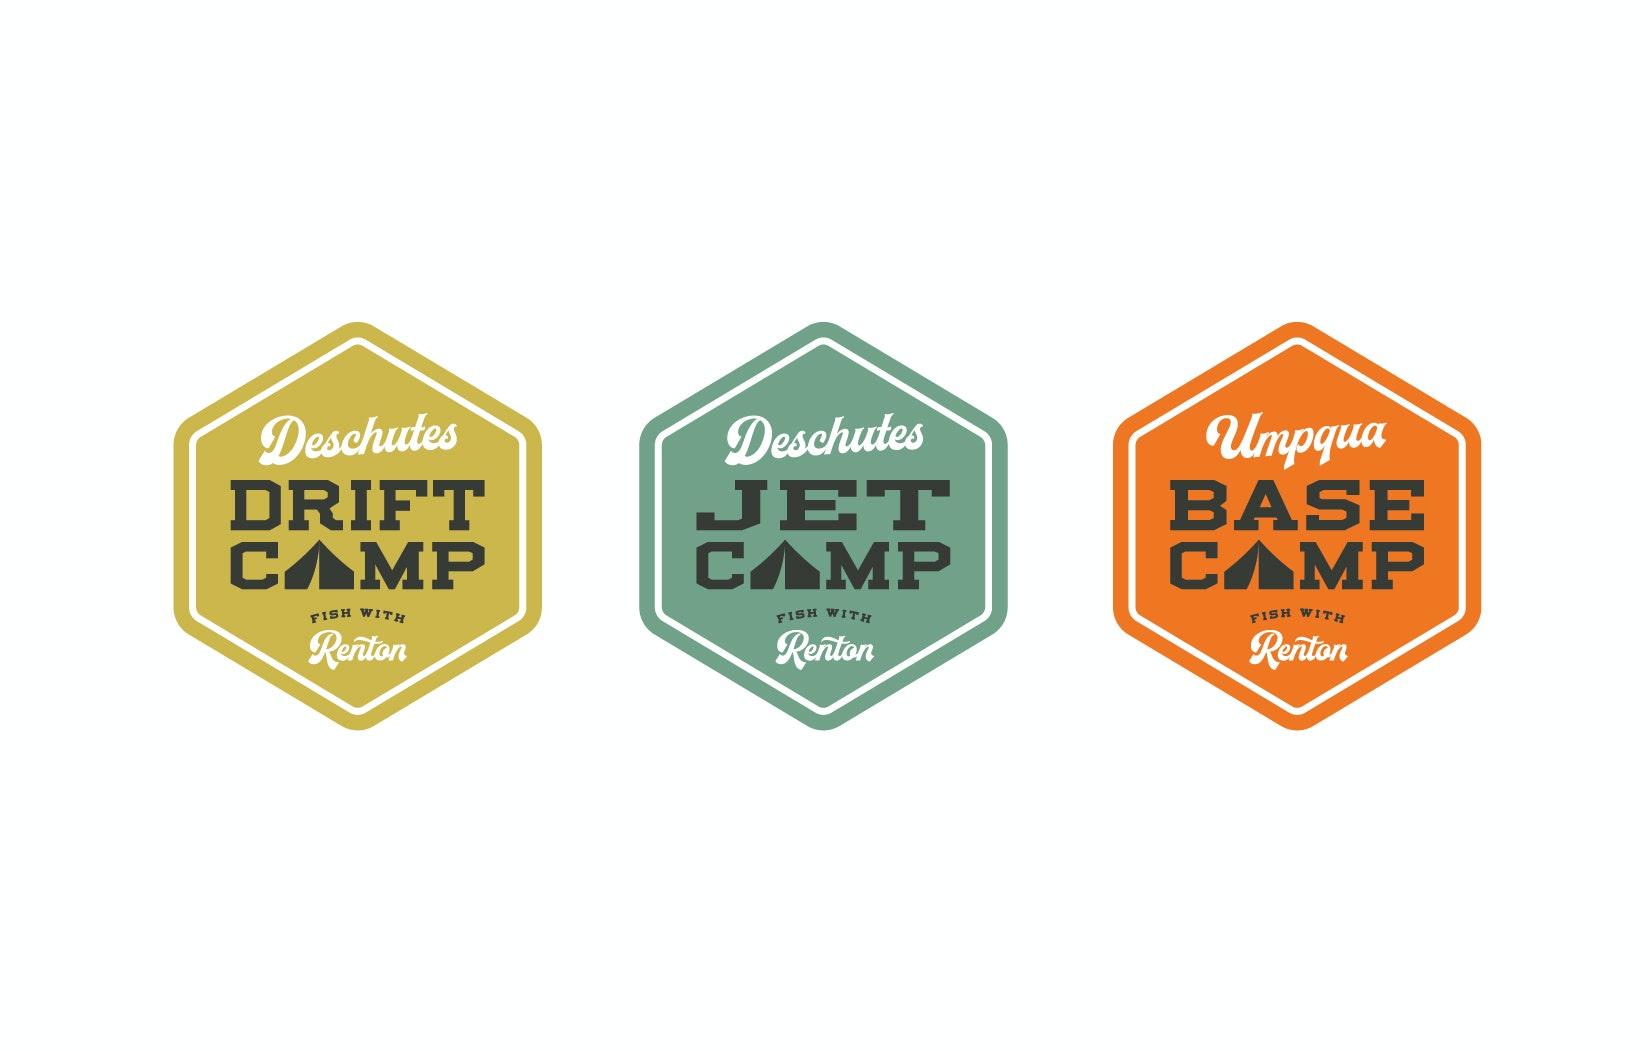 JEFF DOOLEY CREATIVE - new logo set 4-5-18-14